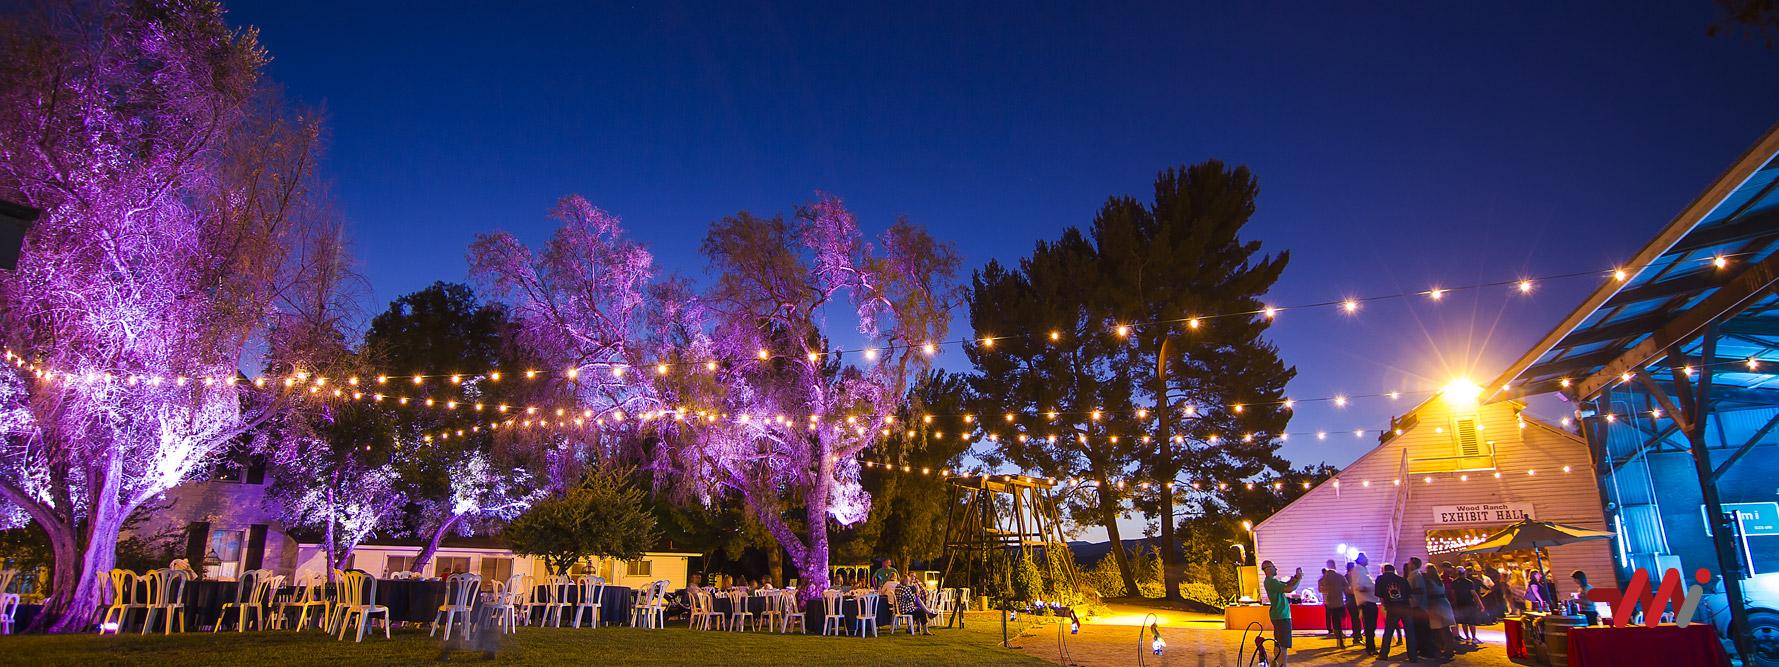 Special Event Lighting Installation